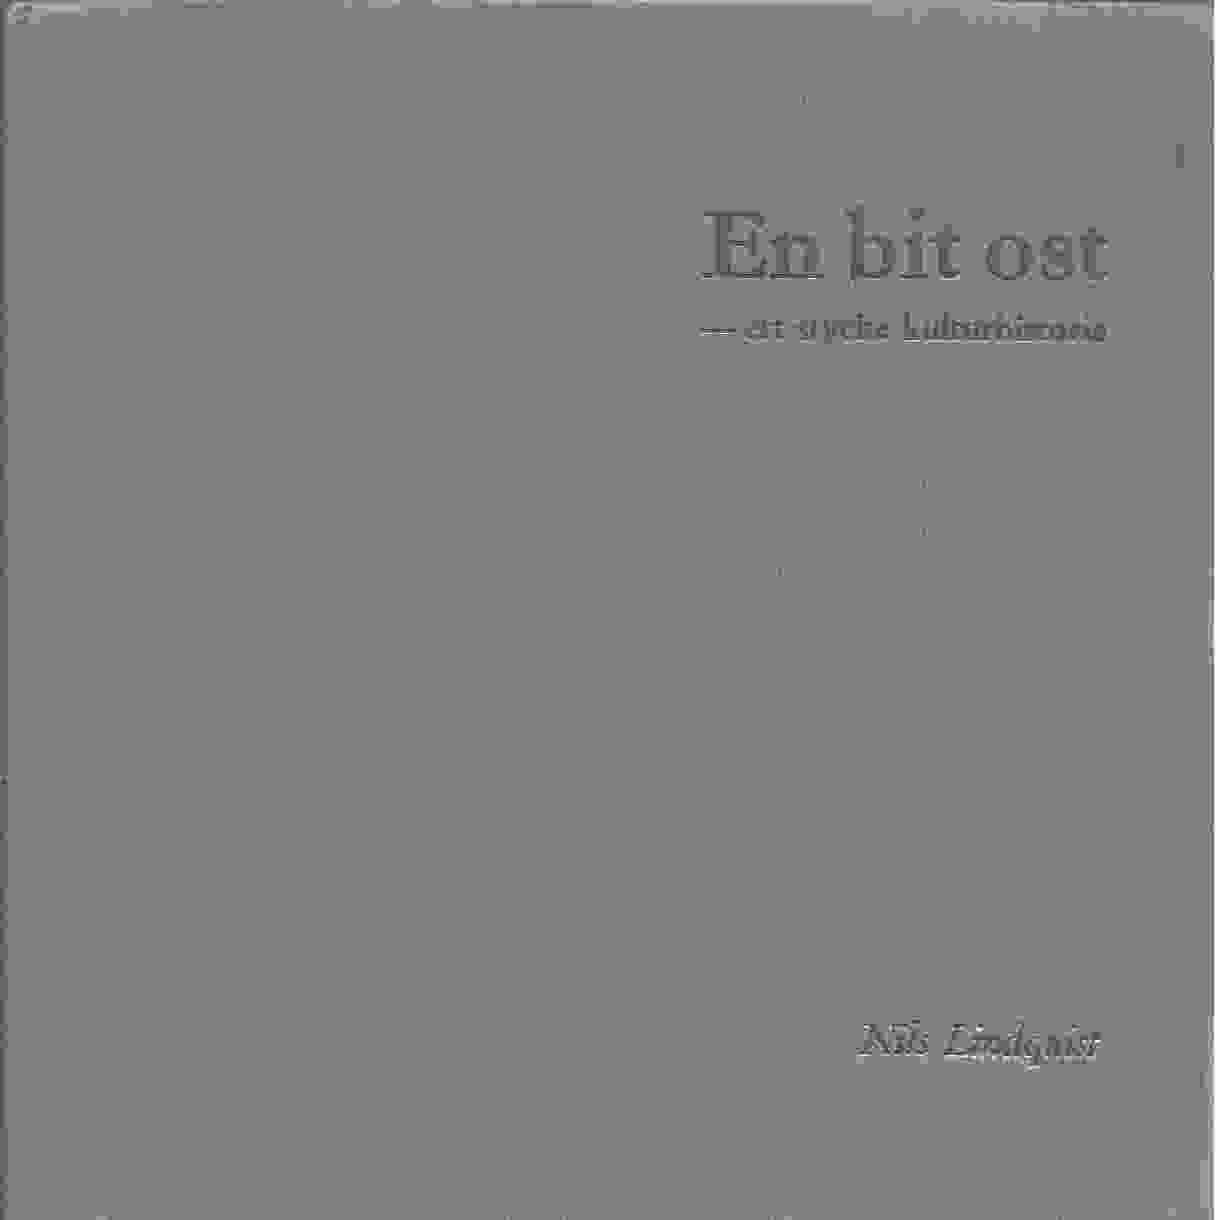 En bit ost : ett stycke kulturhistoria - Lindquist, Nils